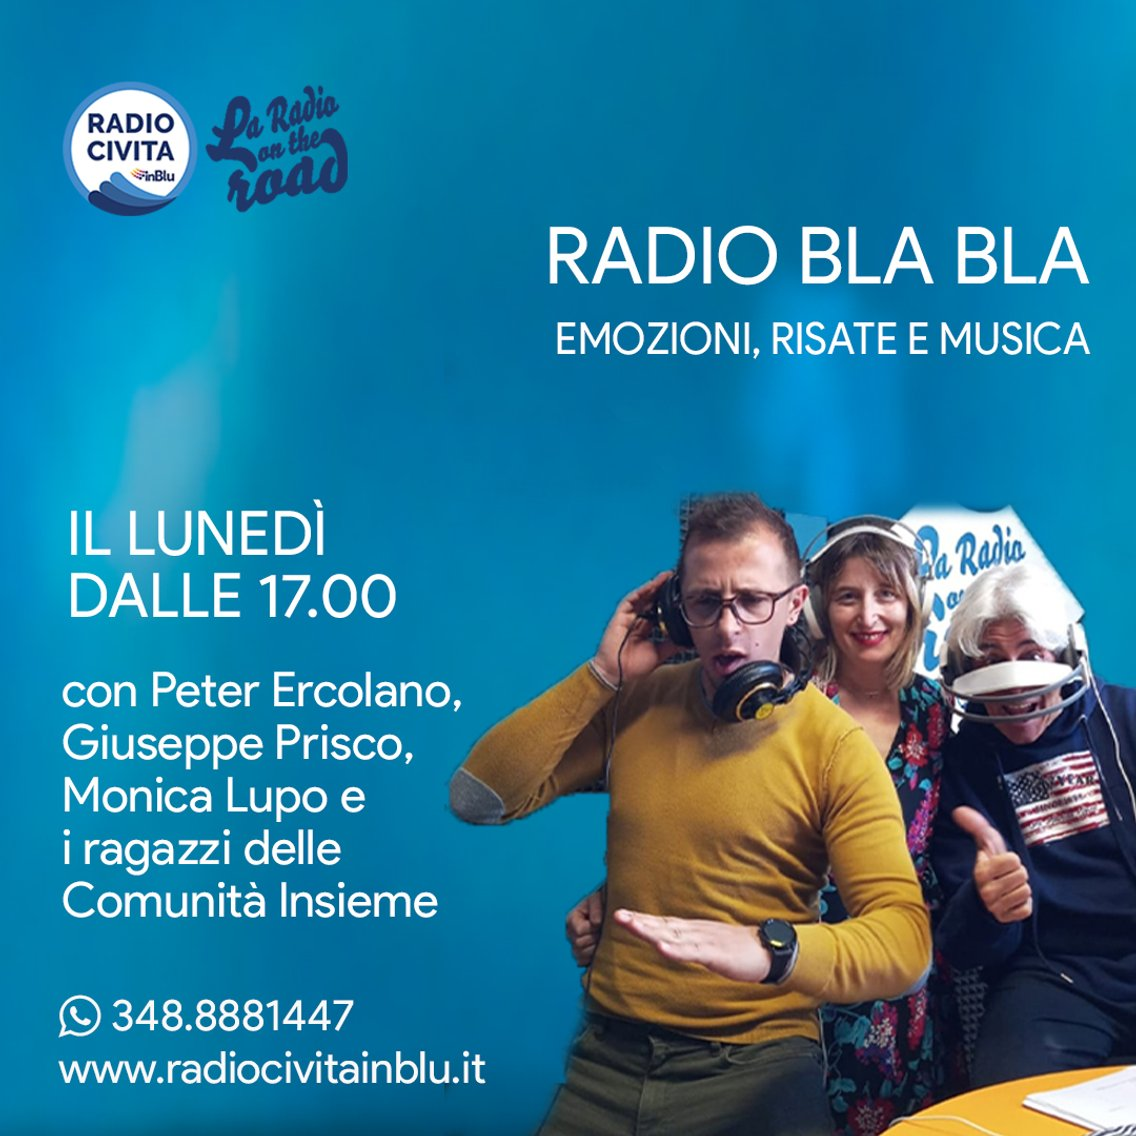 Radio Bla Bla - imagen de portada